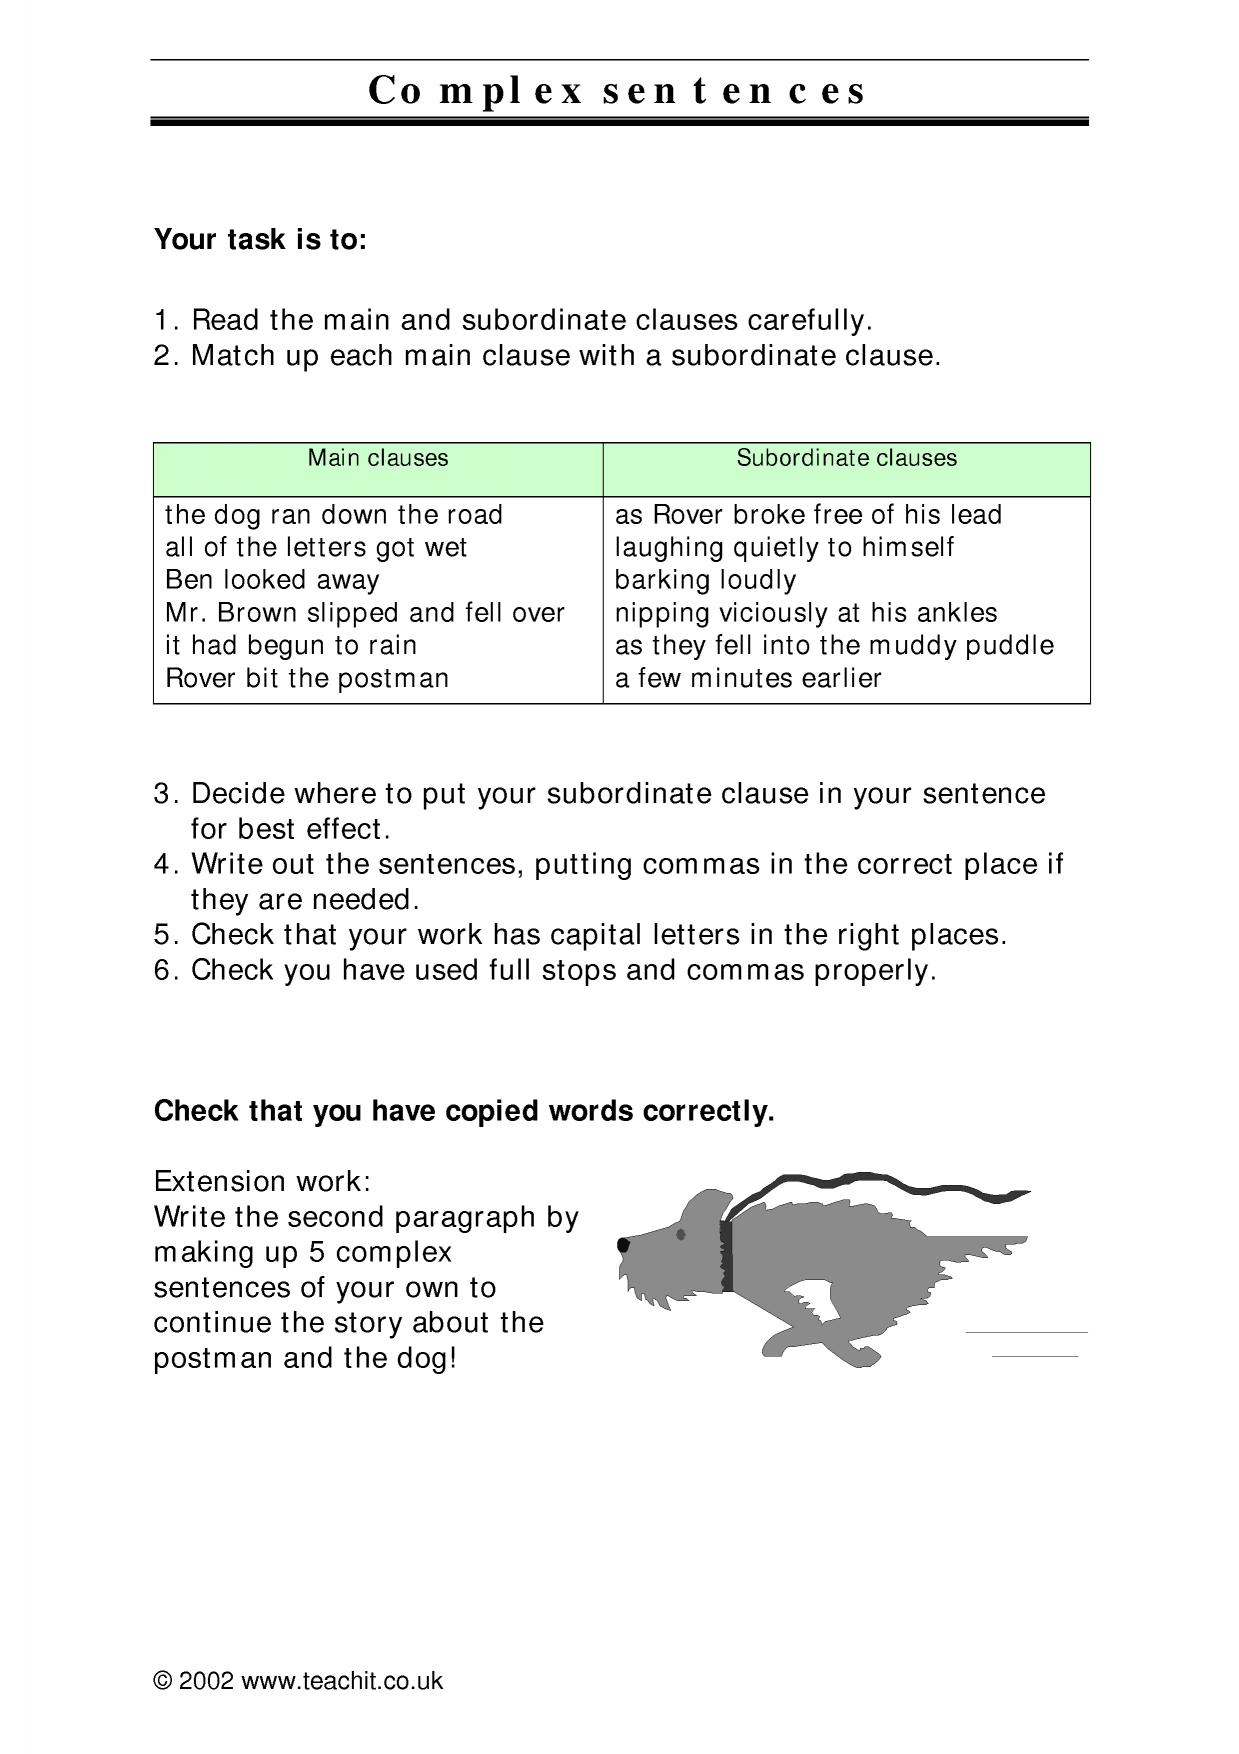 Ks3 Grammar And Vocabulary Sentence Construction Teachit English